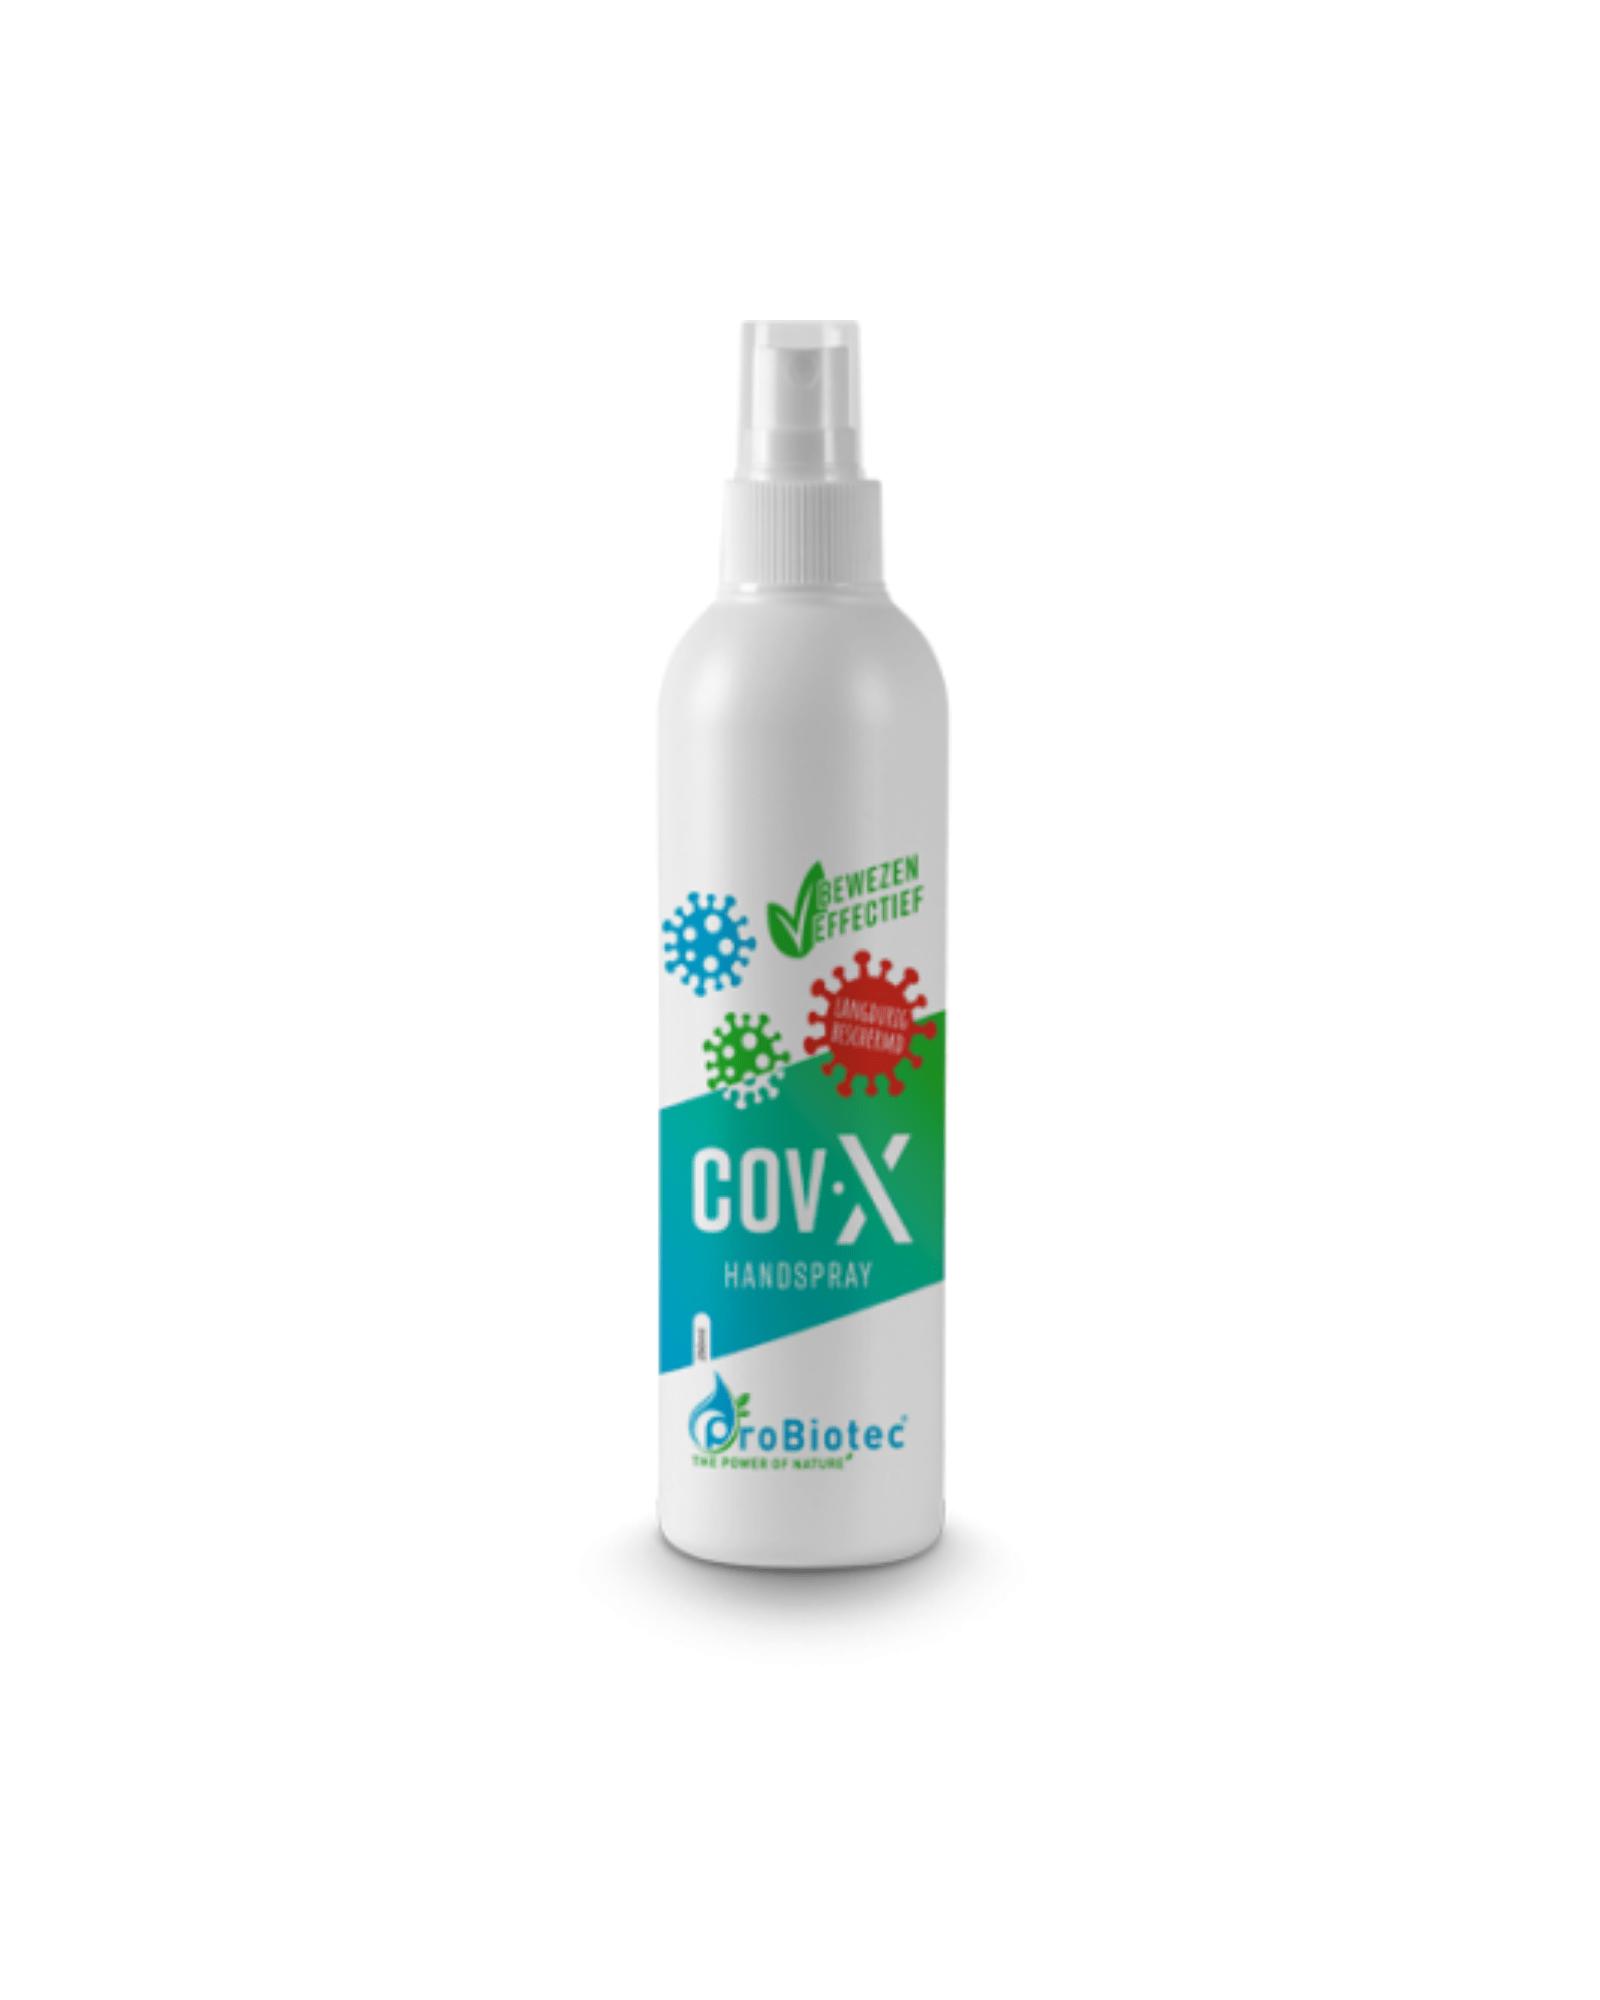 COV-X handspray | KoffiePartners